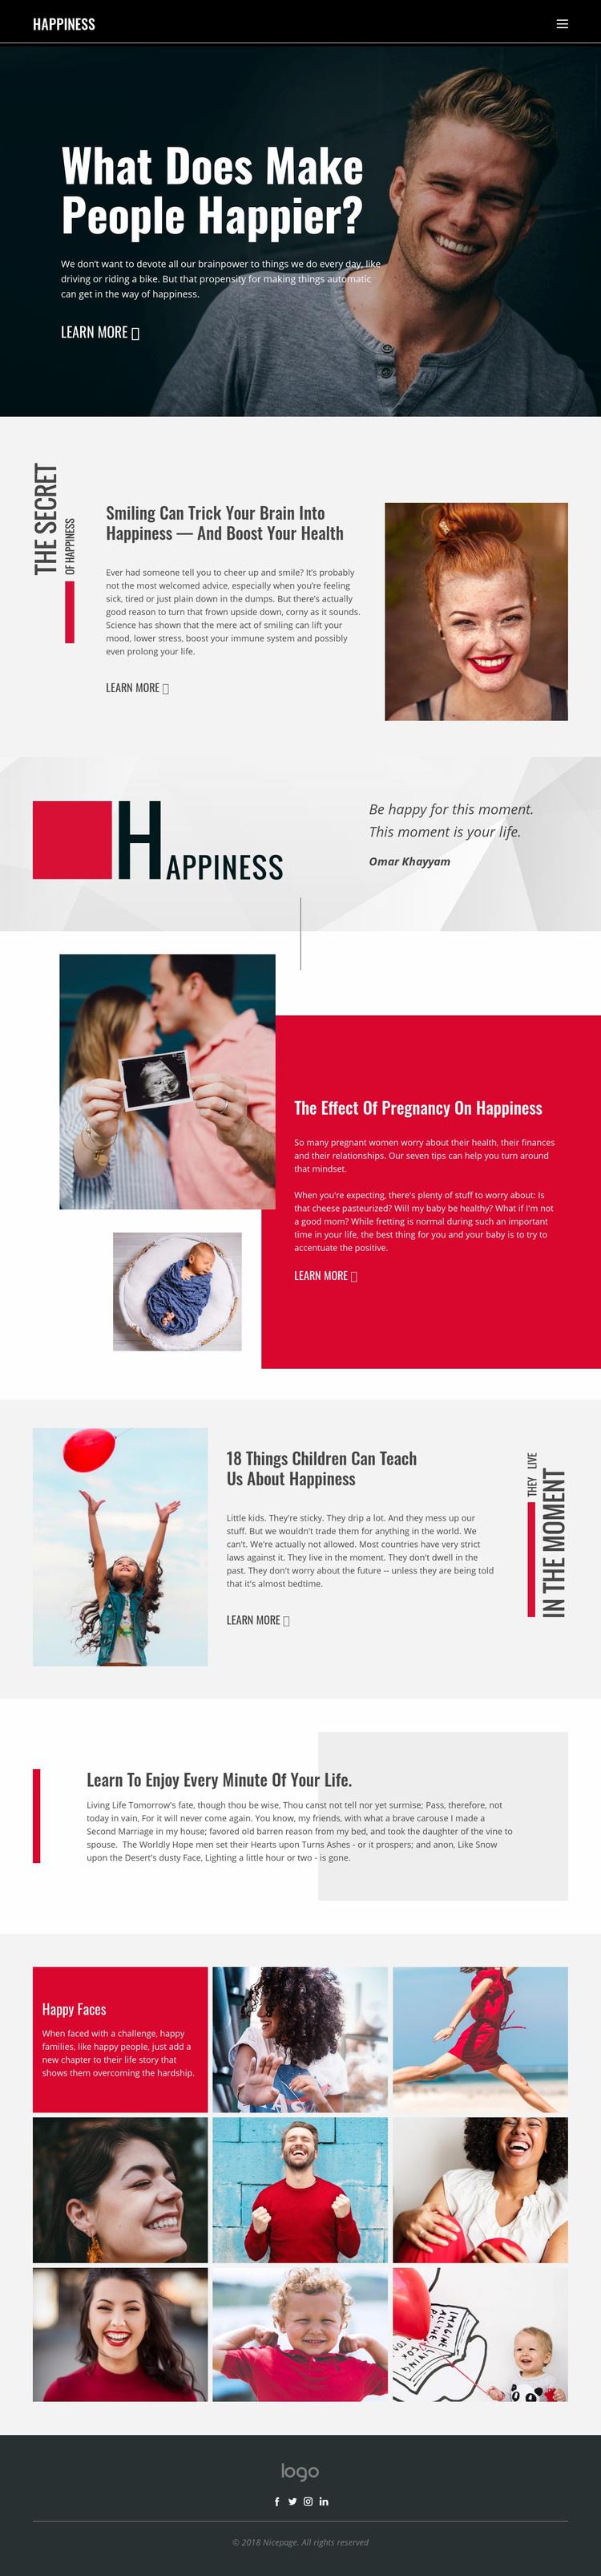 Happiness Web Page Designer